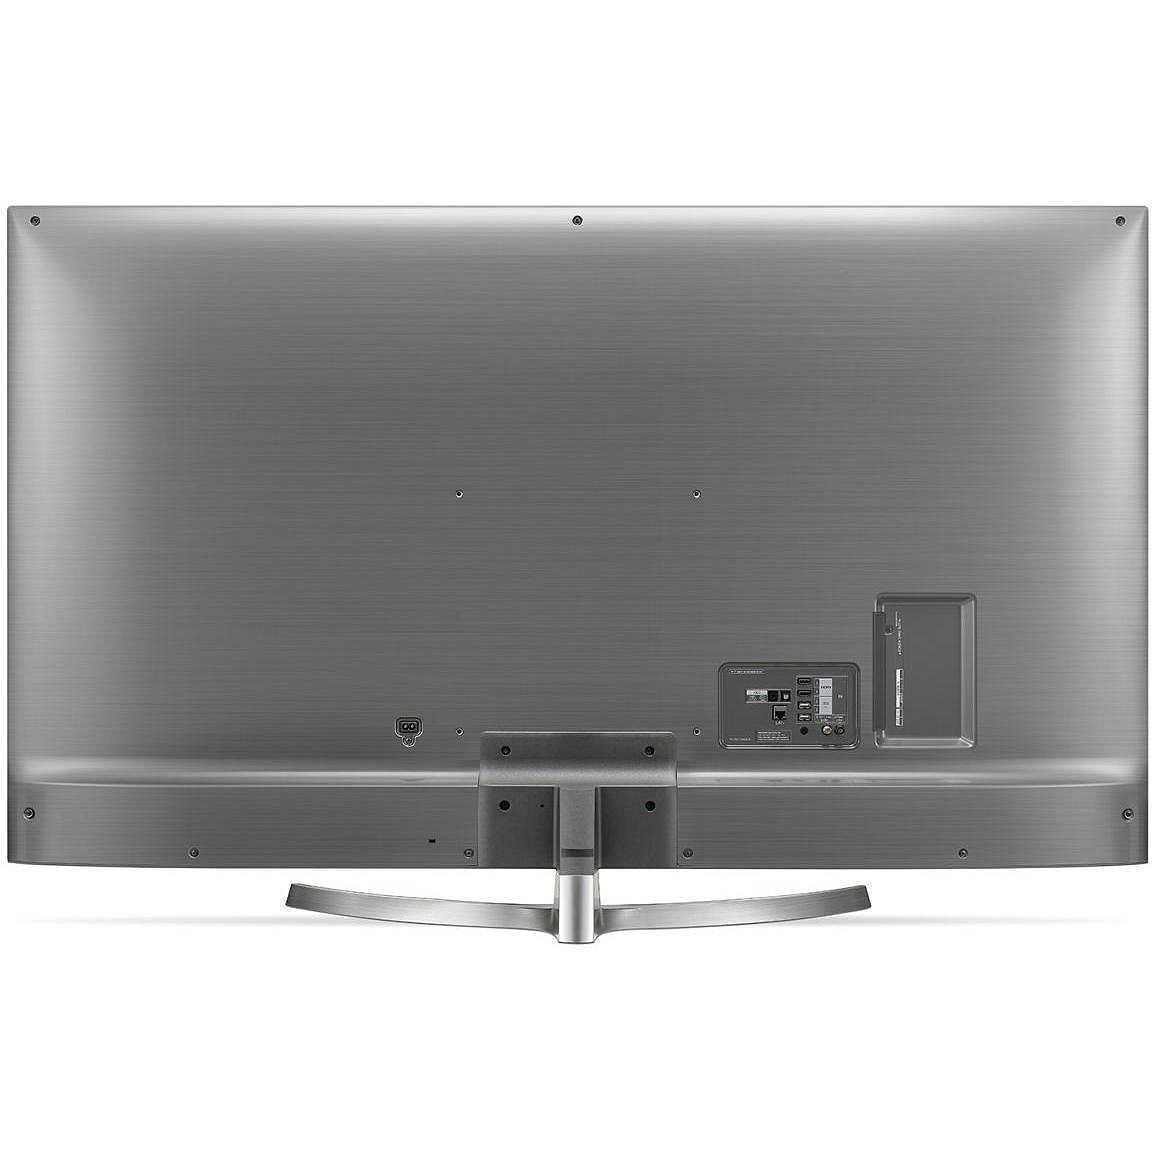 "Lg Uhd Tv 4k 49 Price In India 55 Zoll Full Hd Gebraucht Outdoor Hdtv Antenna 100 Mile Range Hdtv Cable Uses: LG 49SK8100 TV 49"" Super Ultra HD NanoCell 4K HDR Smart TV"